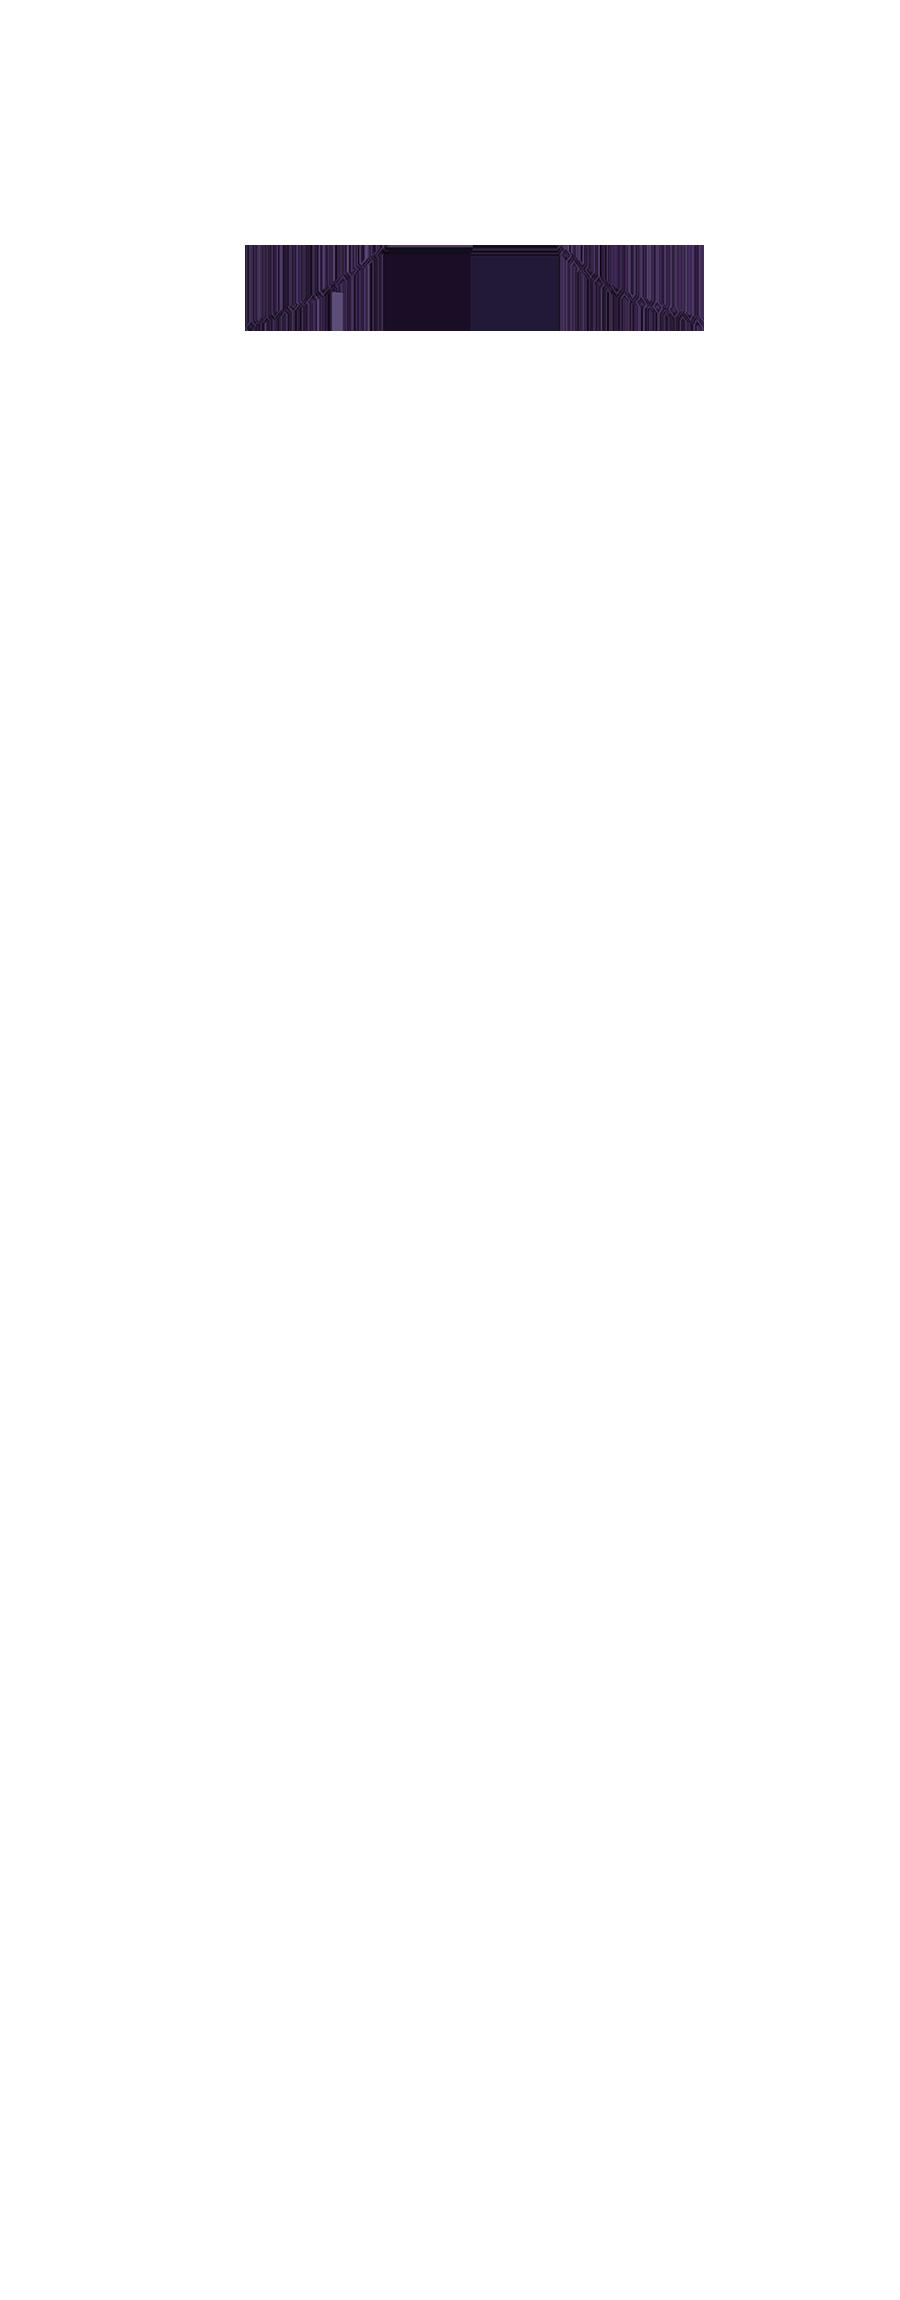 NEFL-18